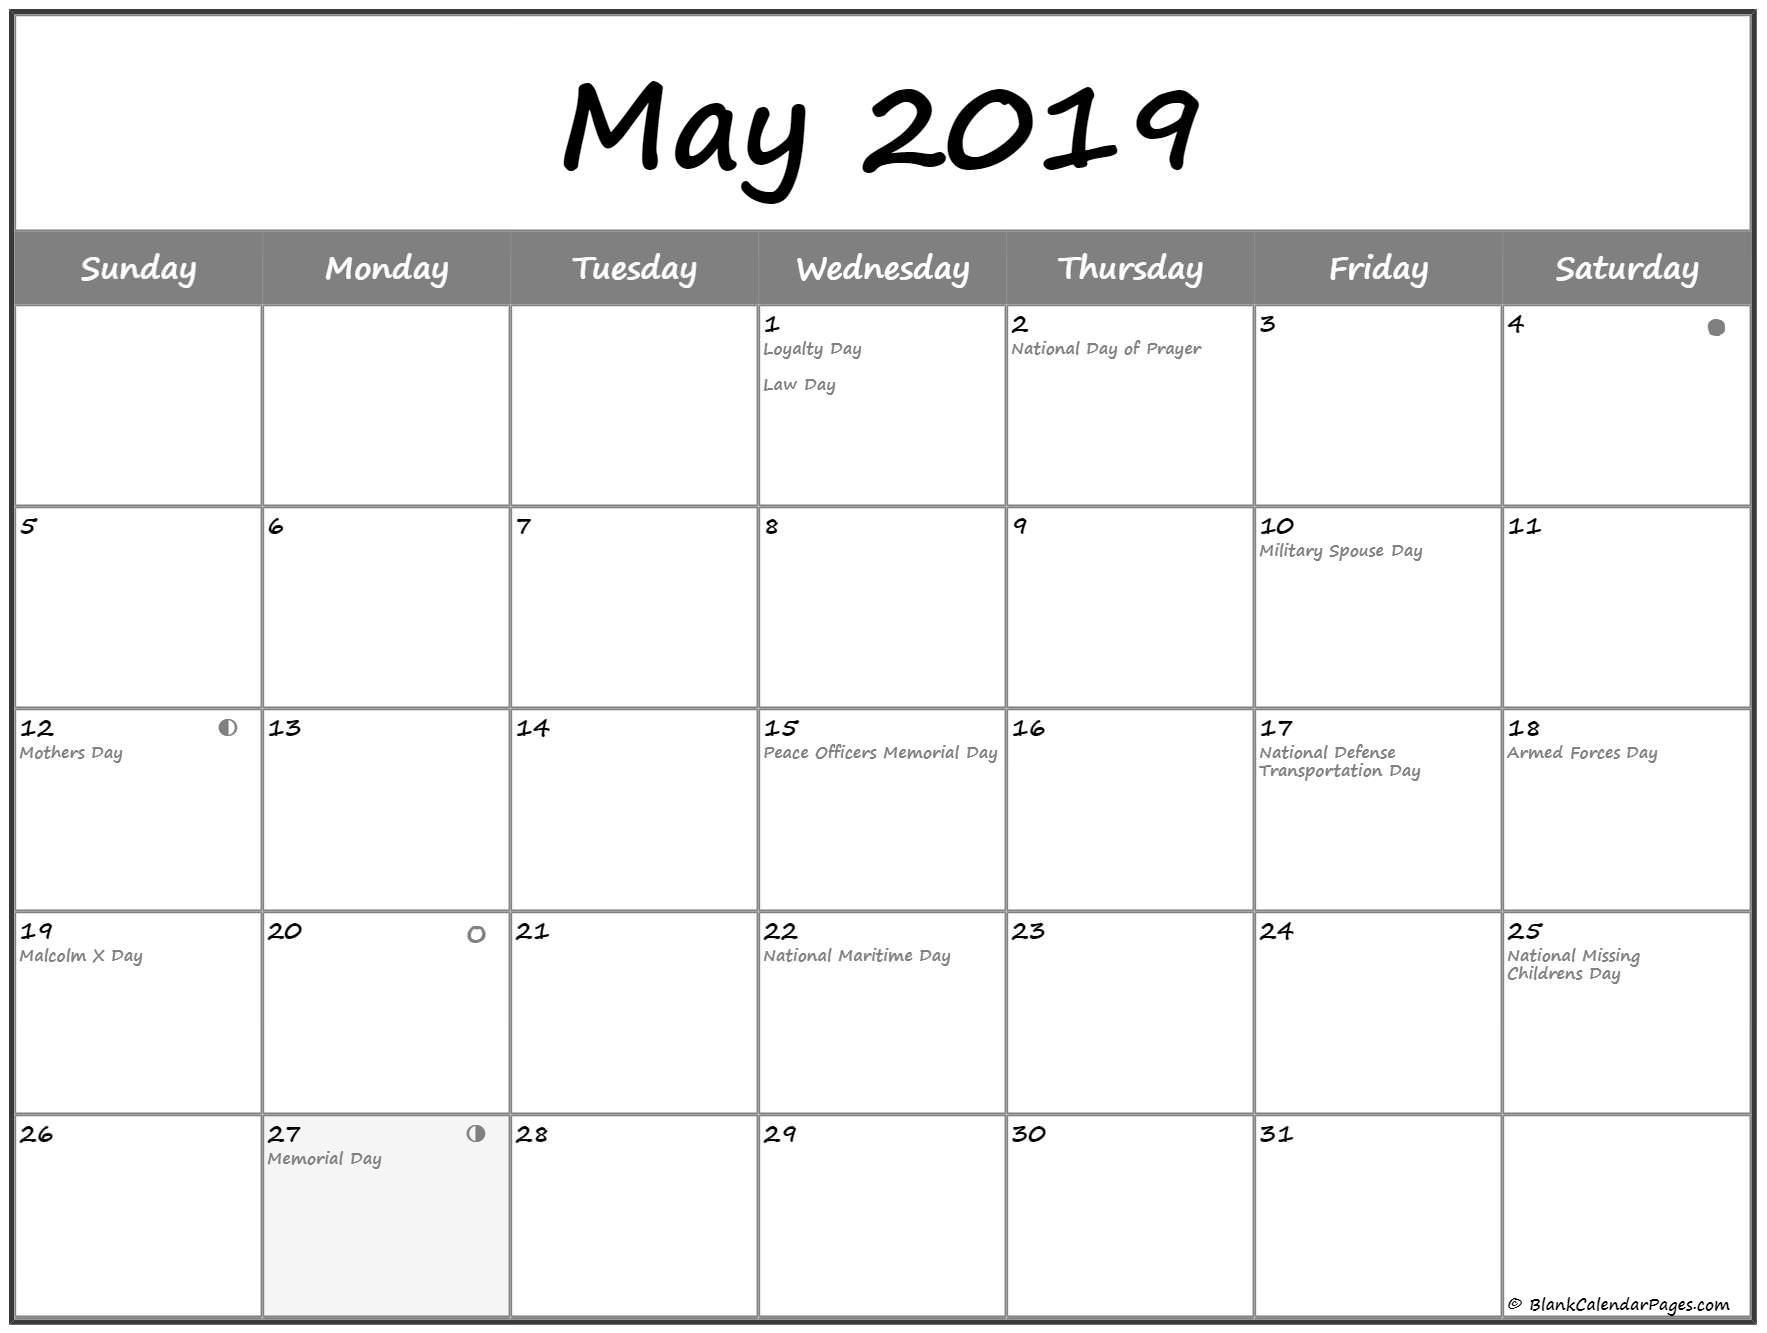 Moon Phases Calendar For May 2019 May 2019 Lunar Calendar Make